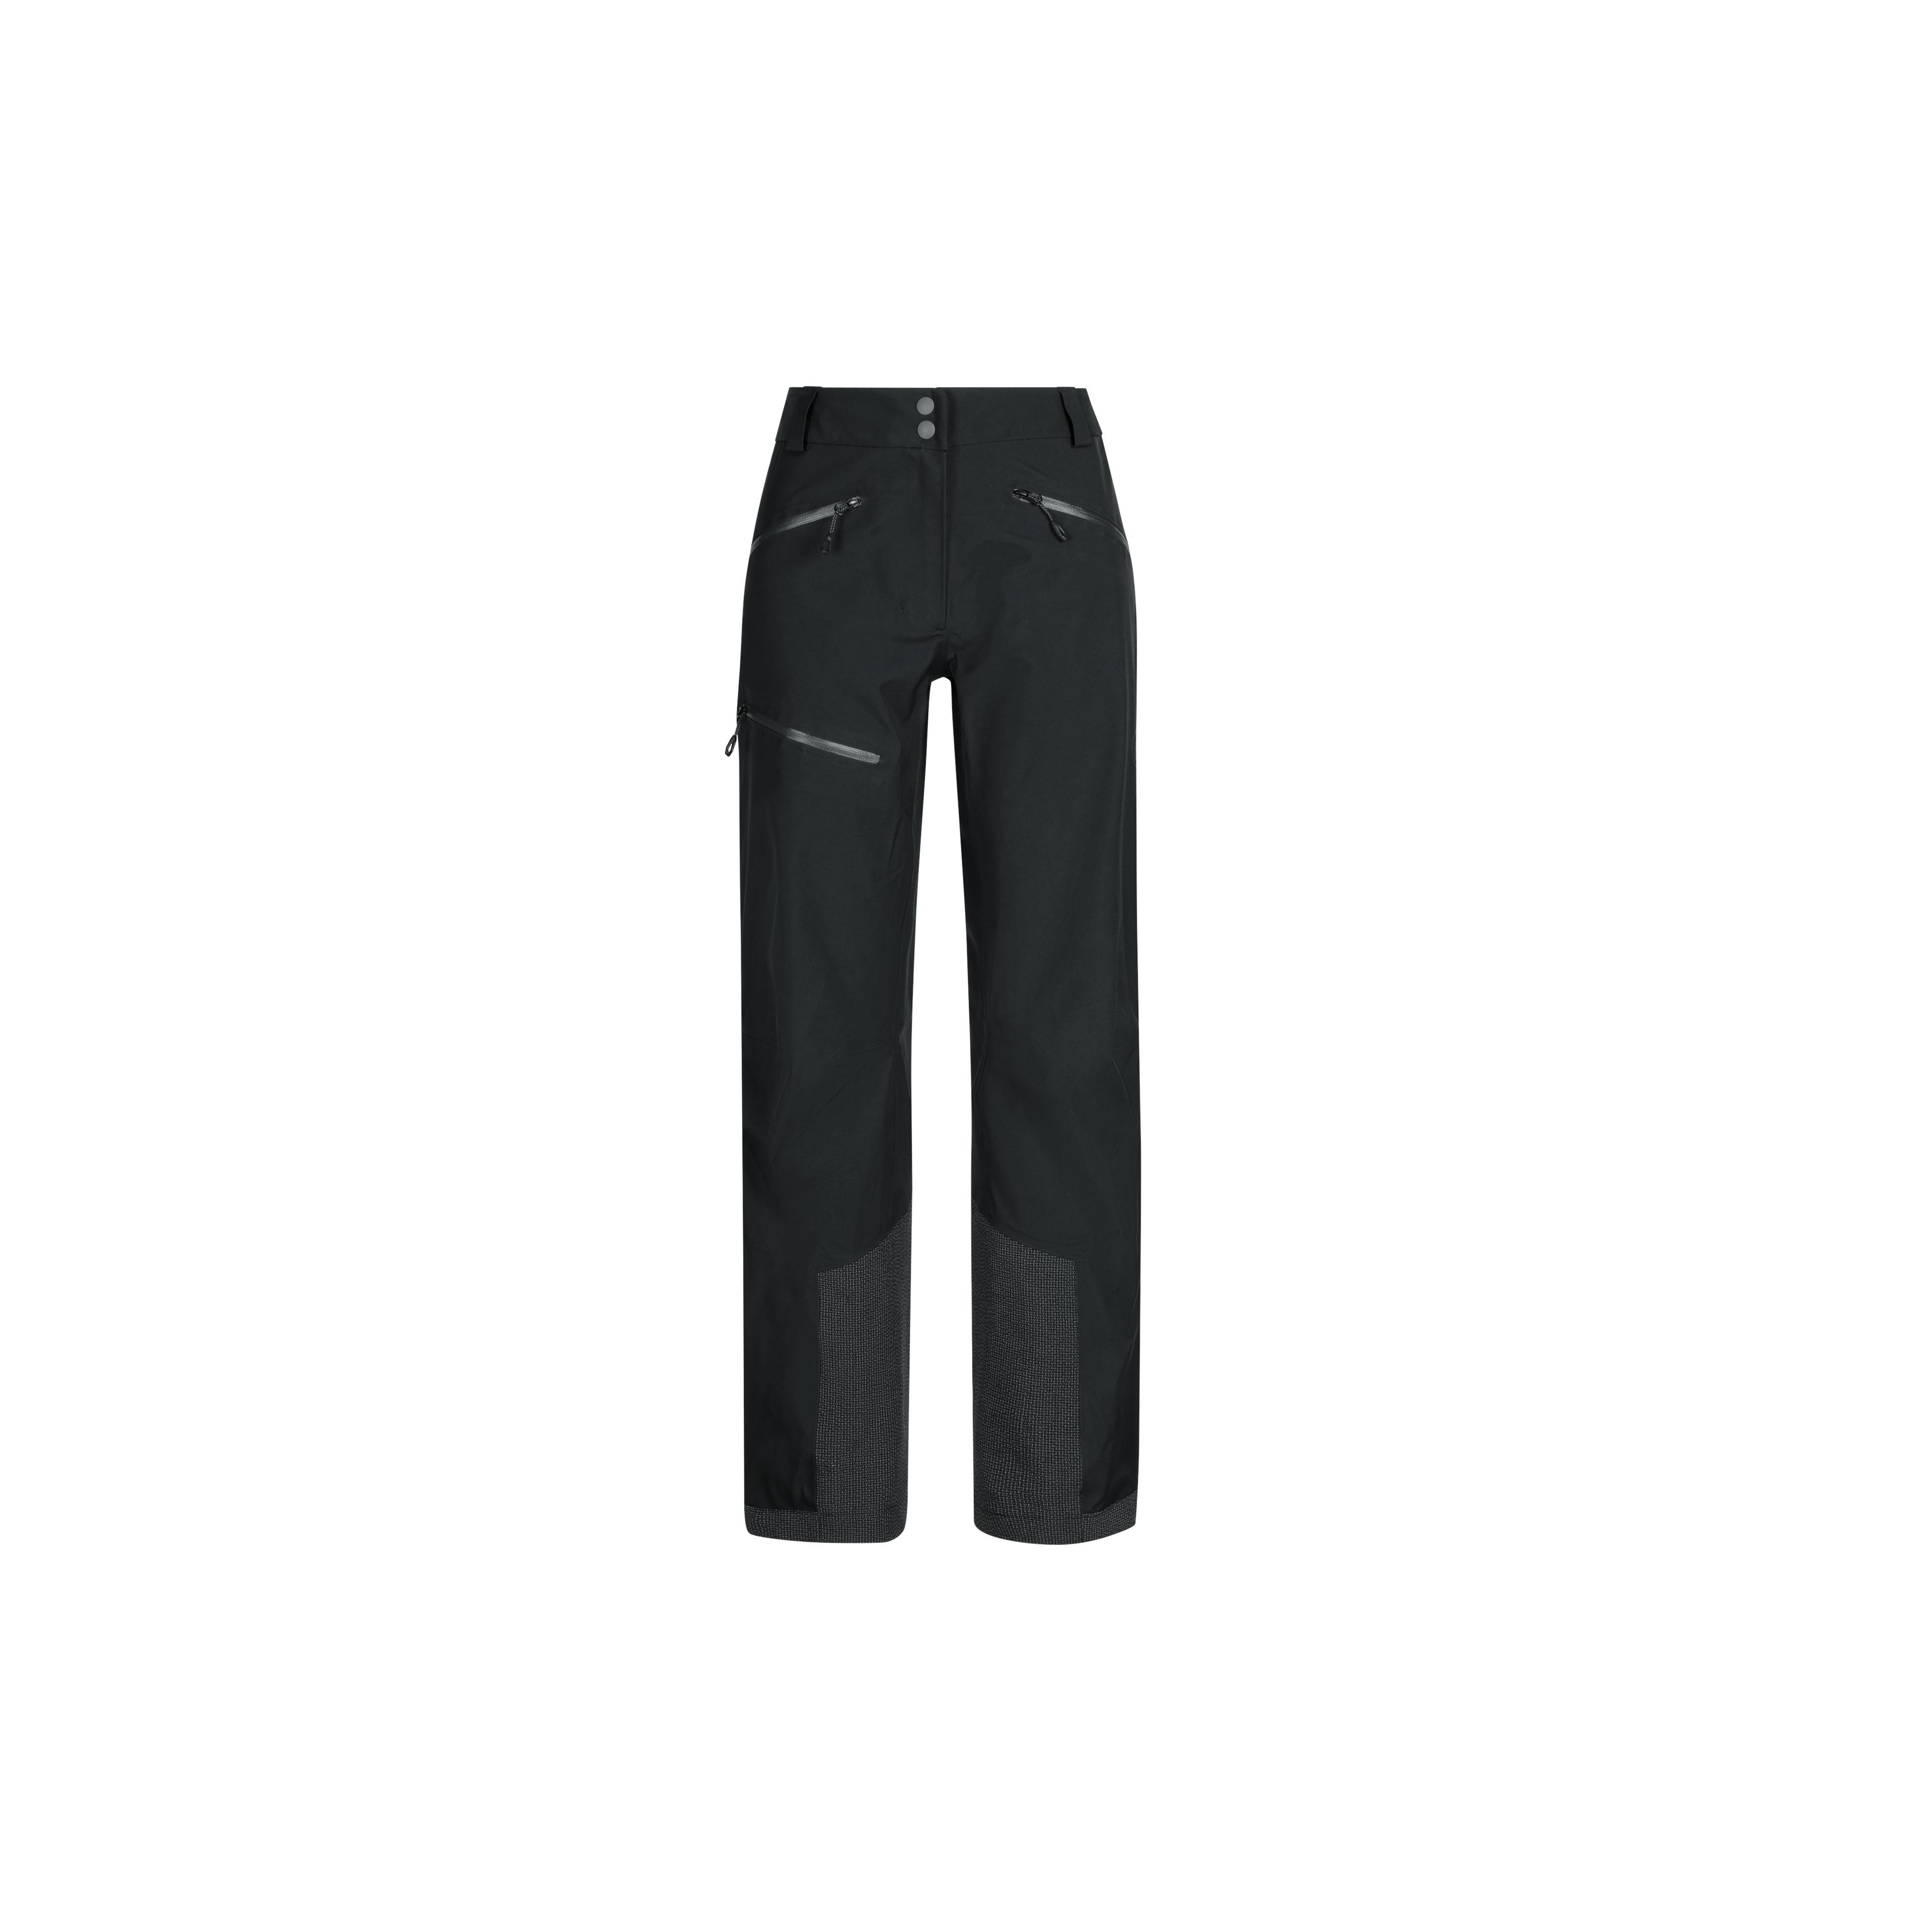 Masao HS Pants Women - black, normal, UK 6 thumbnail